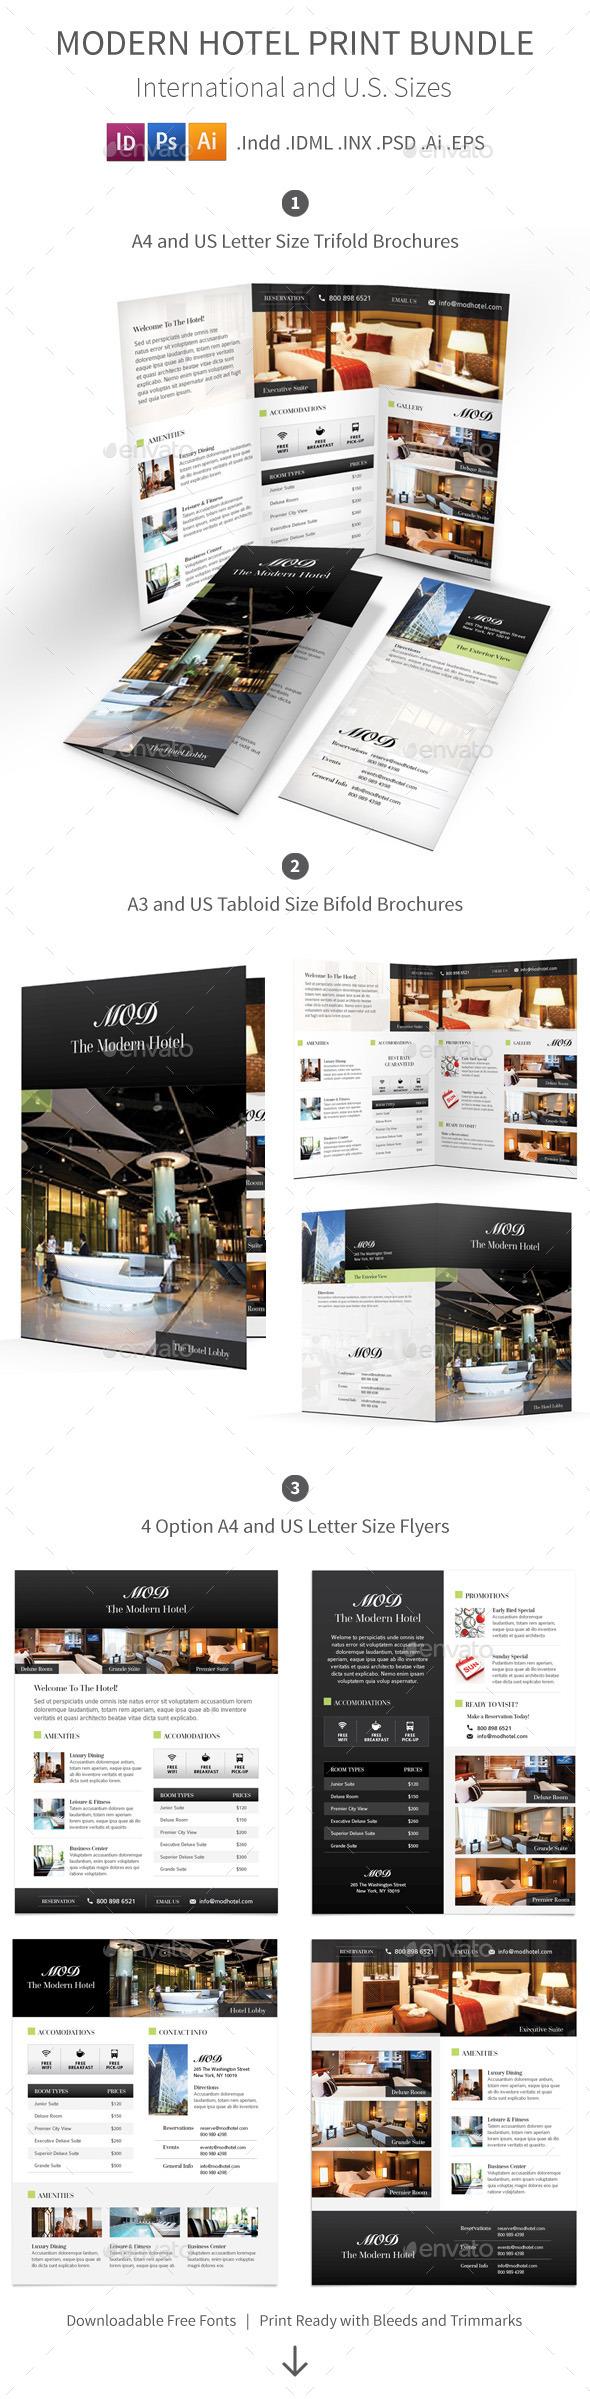 GraphicRiver Modern Hotel Print Bundle 9406221